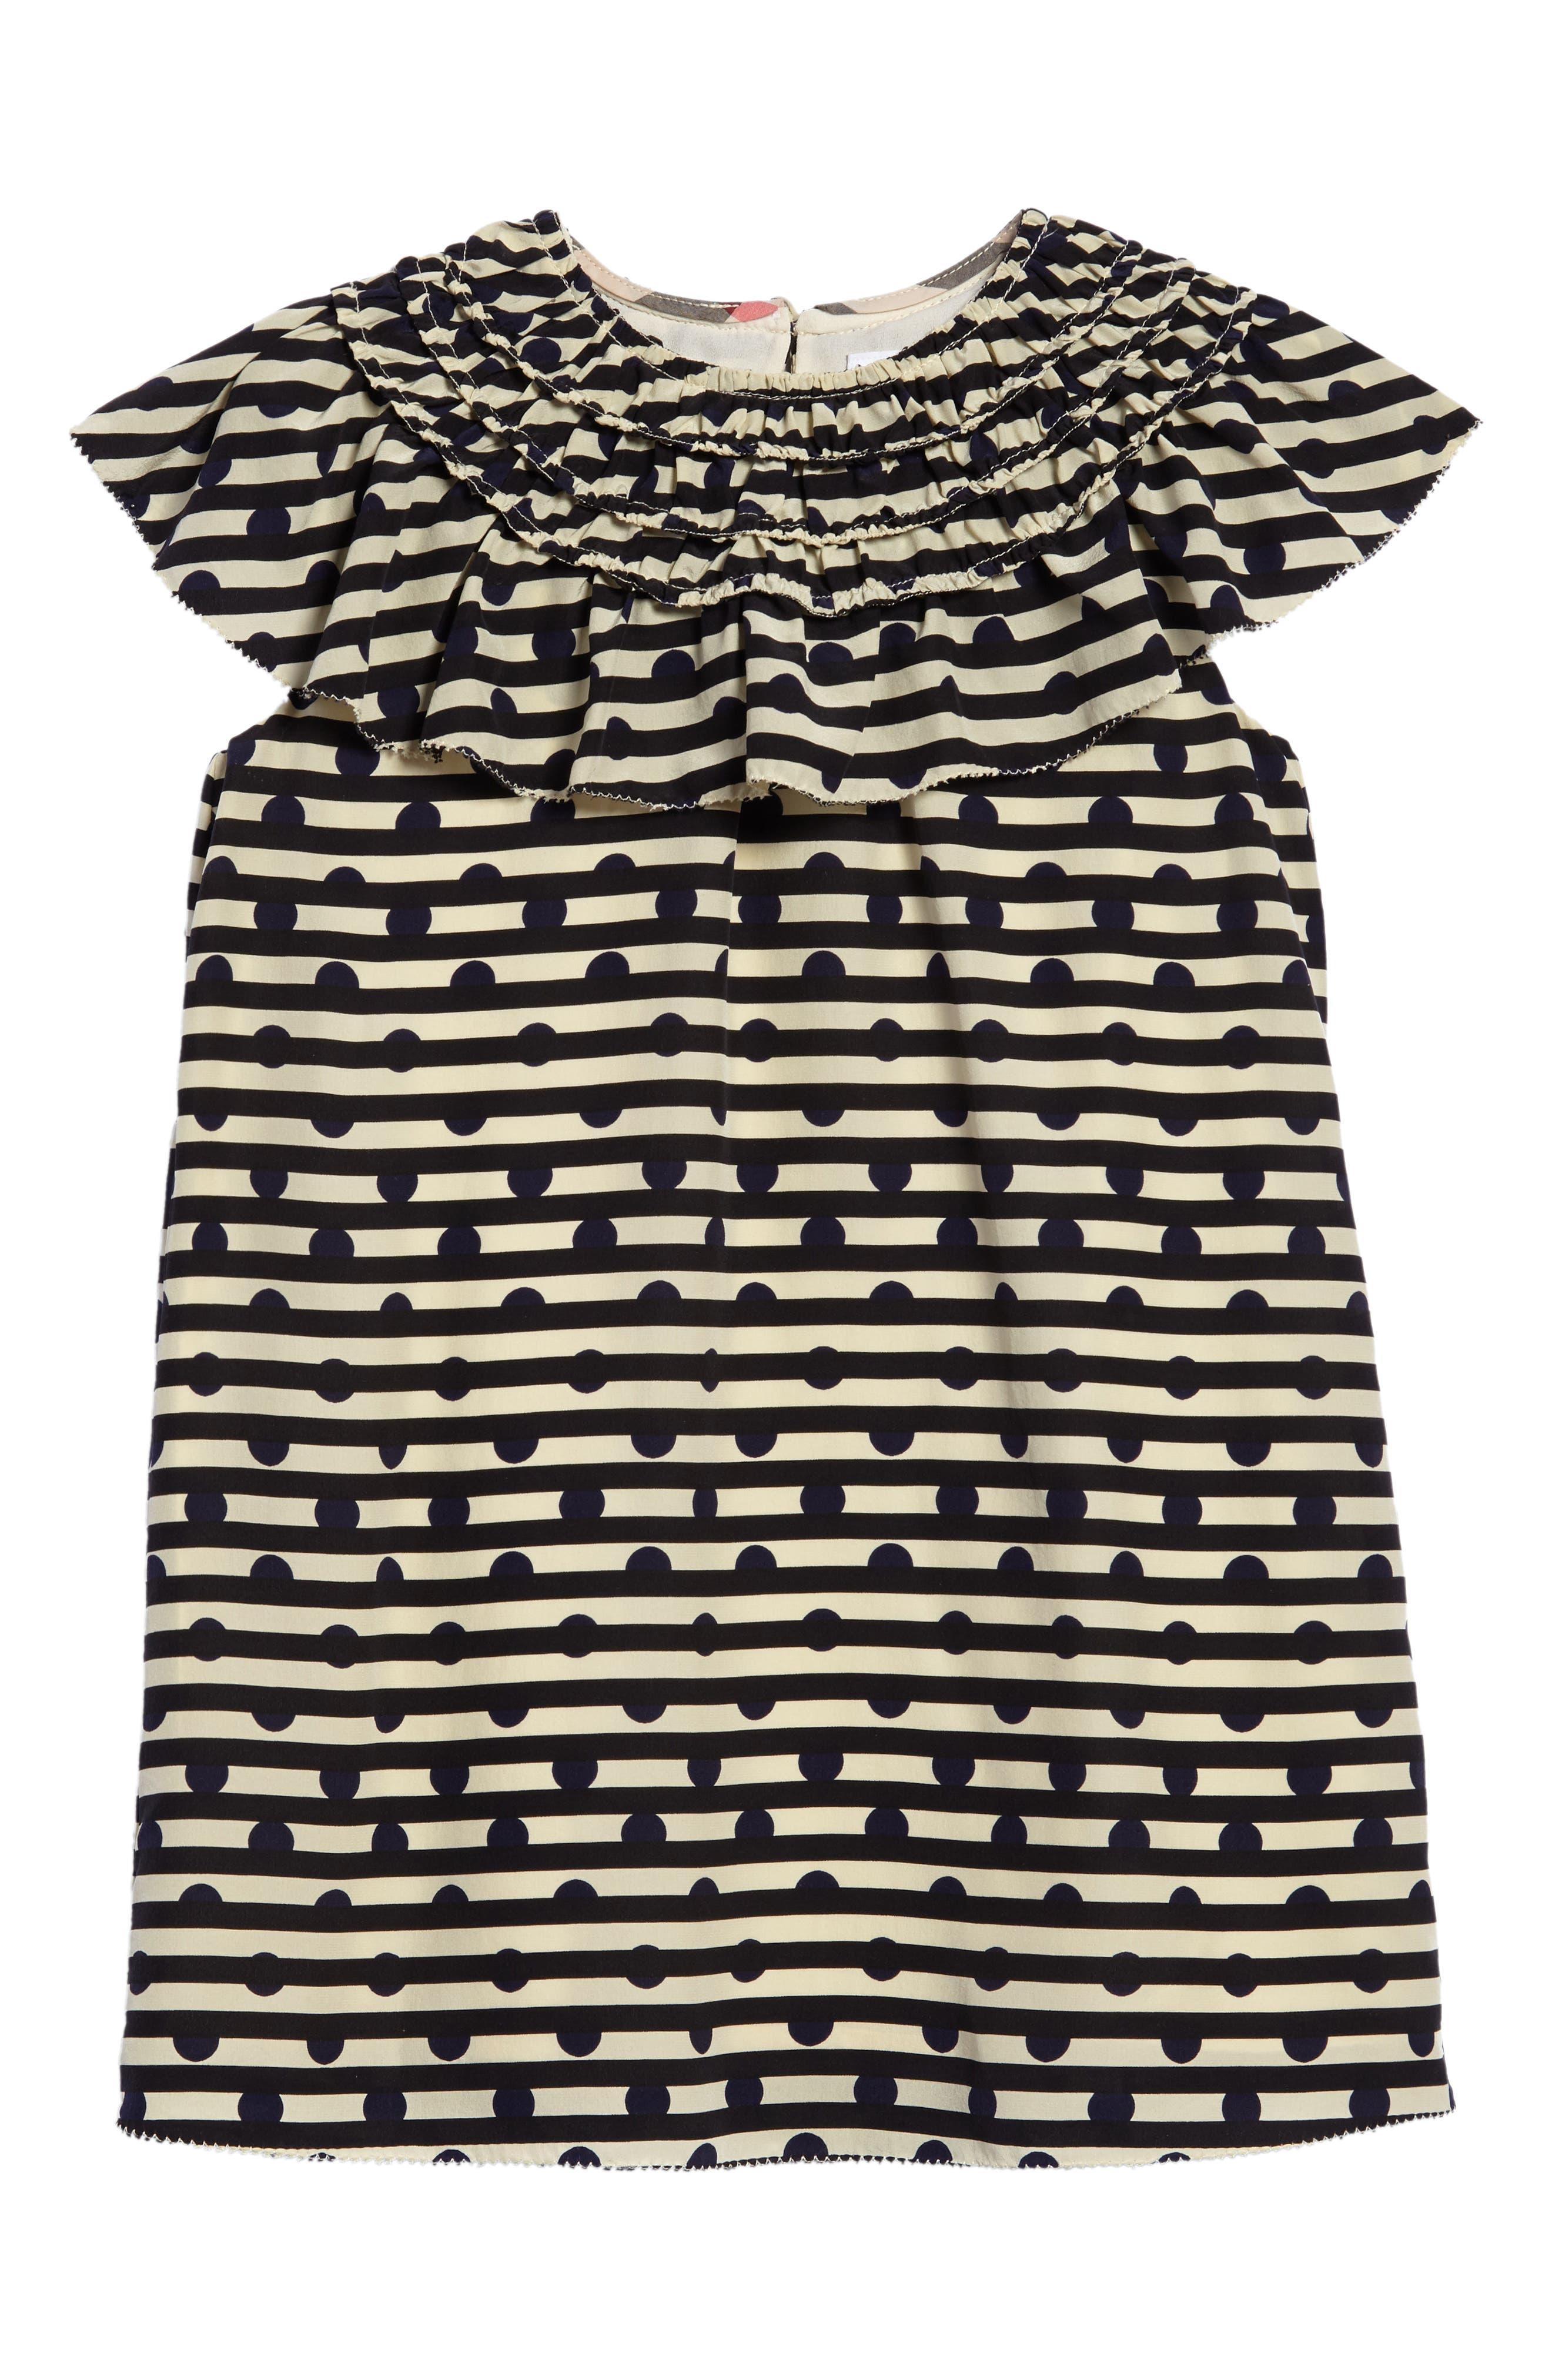 Alternate Image 1 Selected - Burberry Lilla Silk Shift Dress (Little Girls & Big Girls)